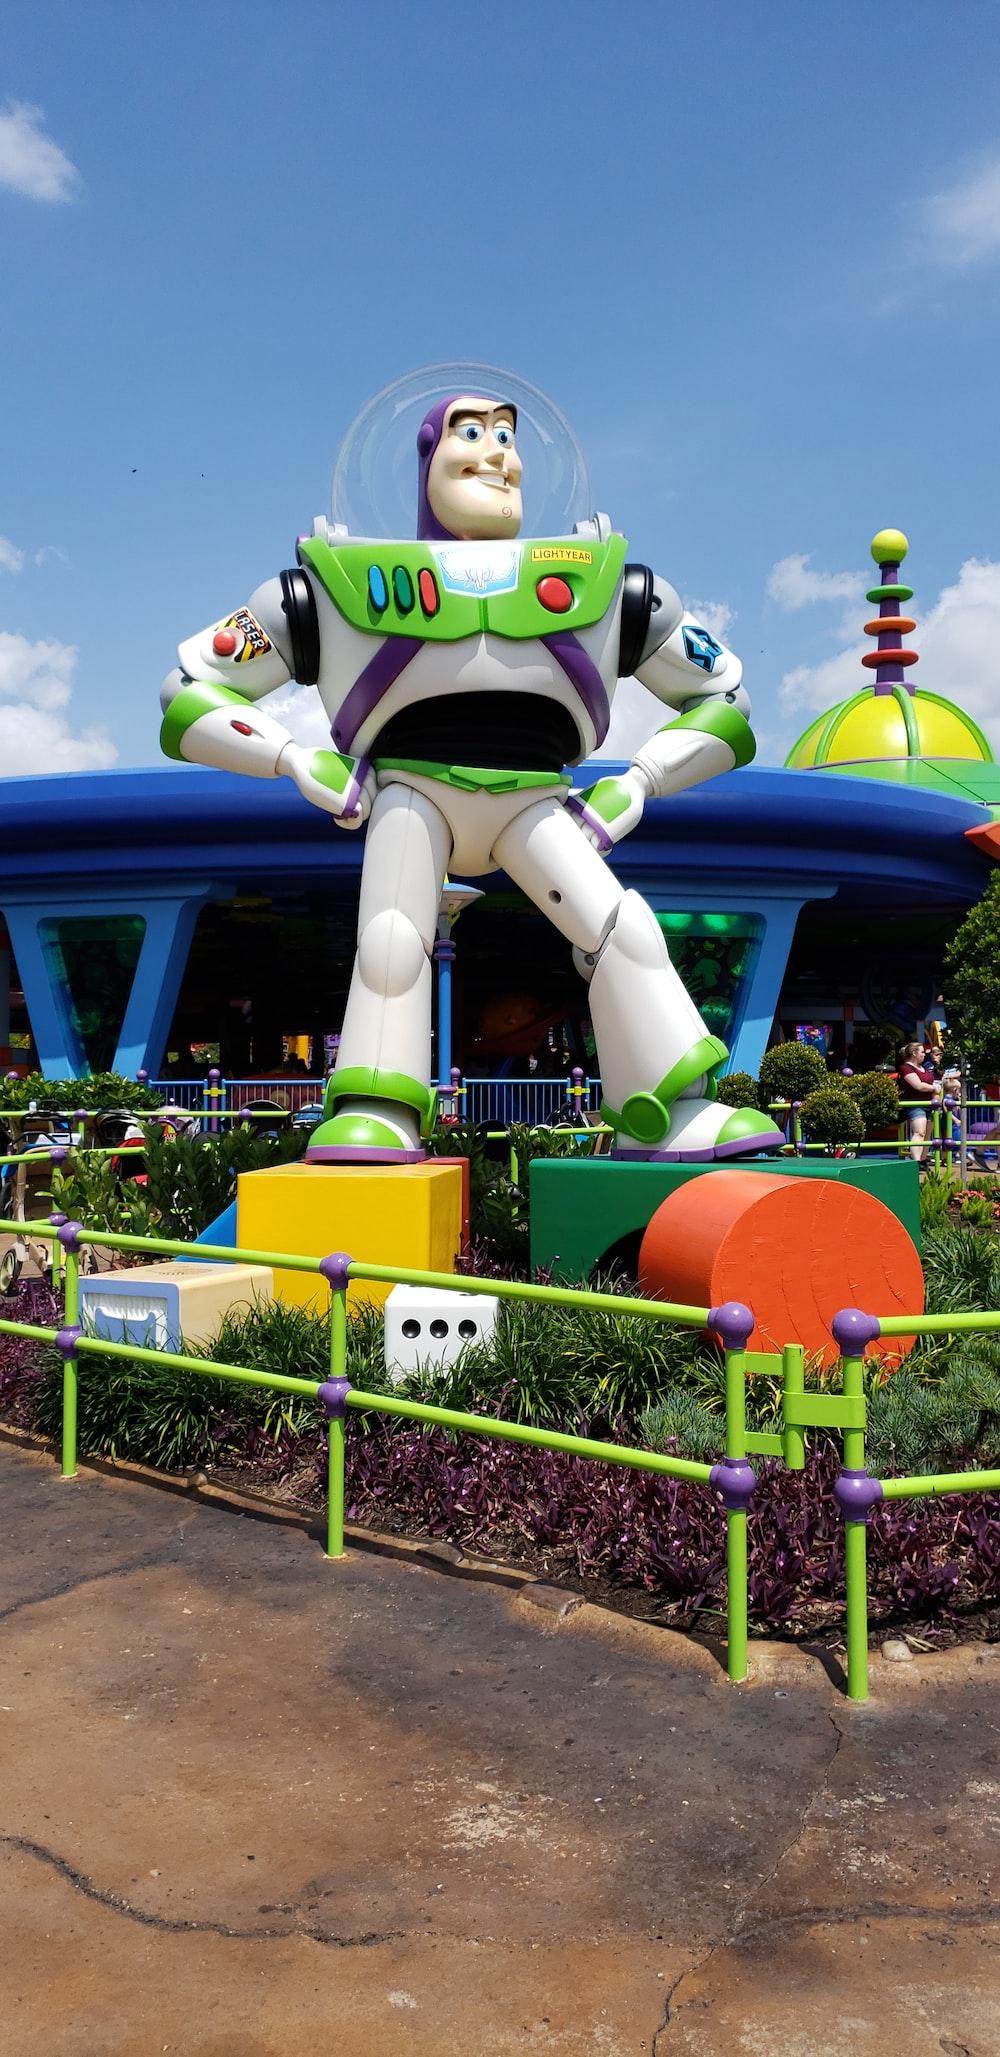 Buzz Lightyear statue